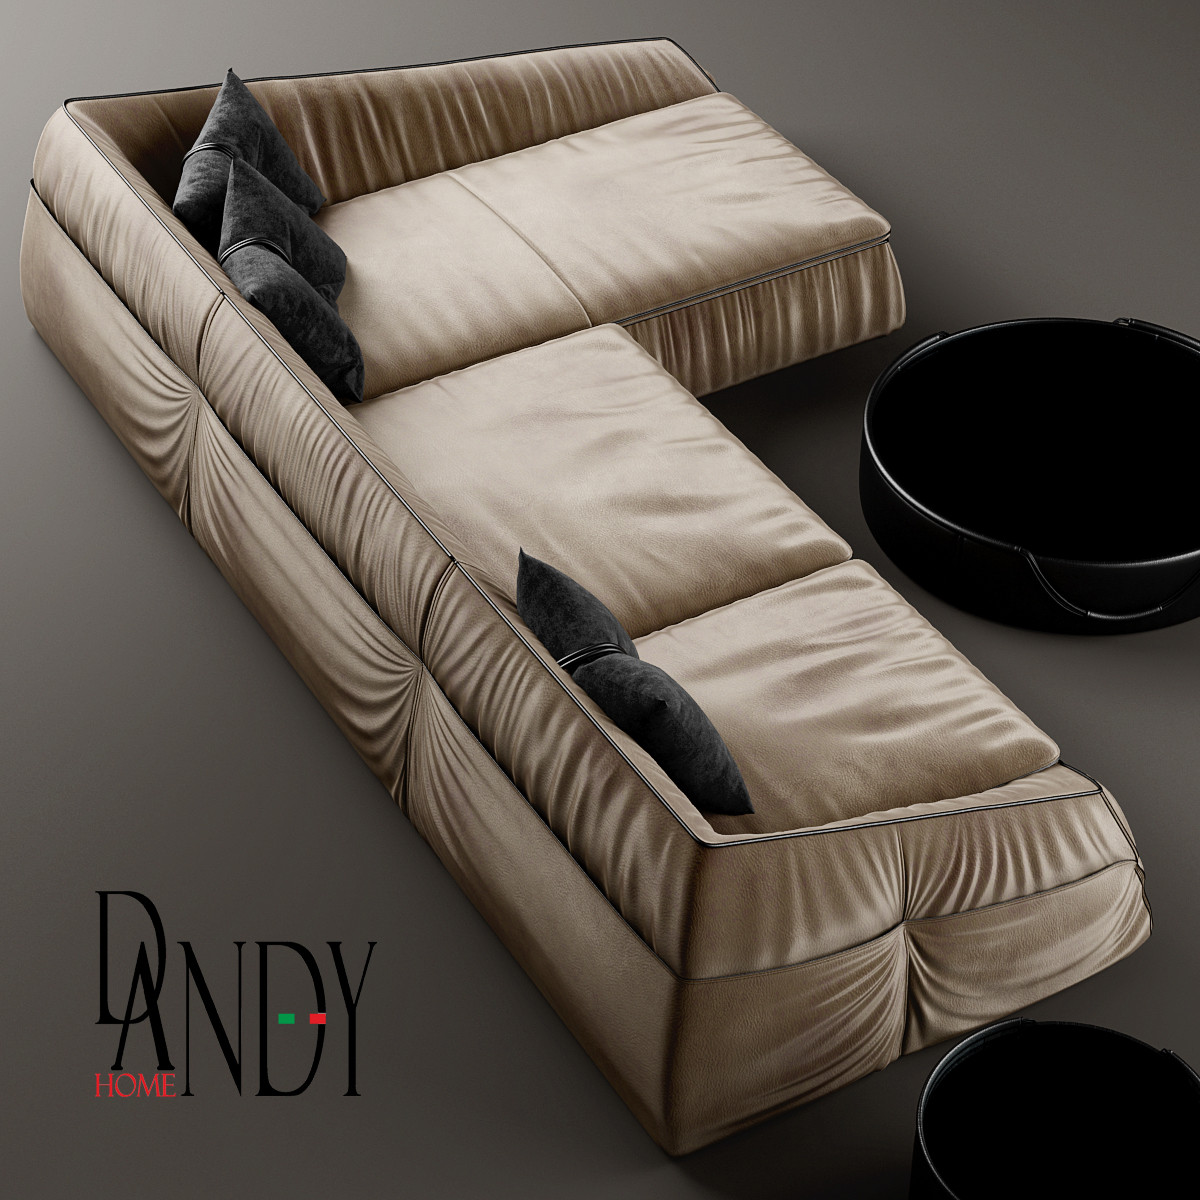 3dsky pro sofa divan gamma arredamenti suite gfxart7 for Dama arredamenti